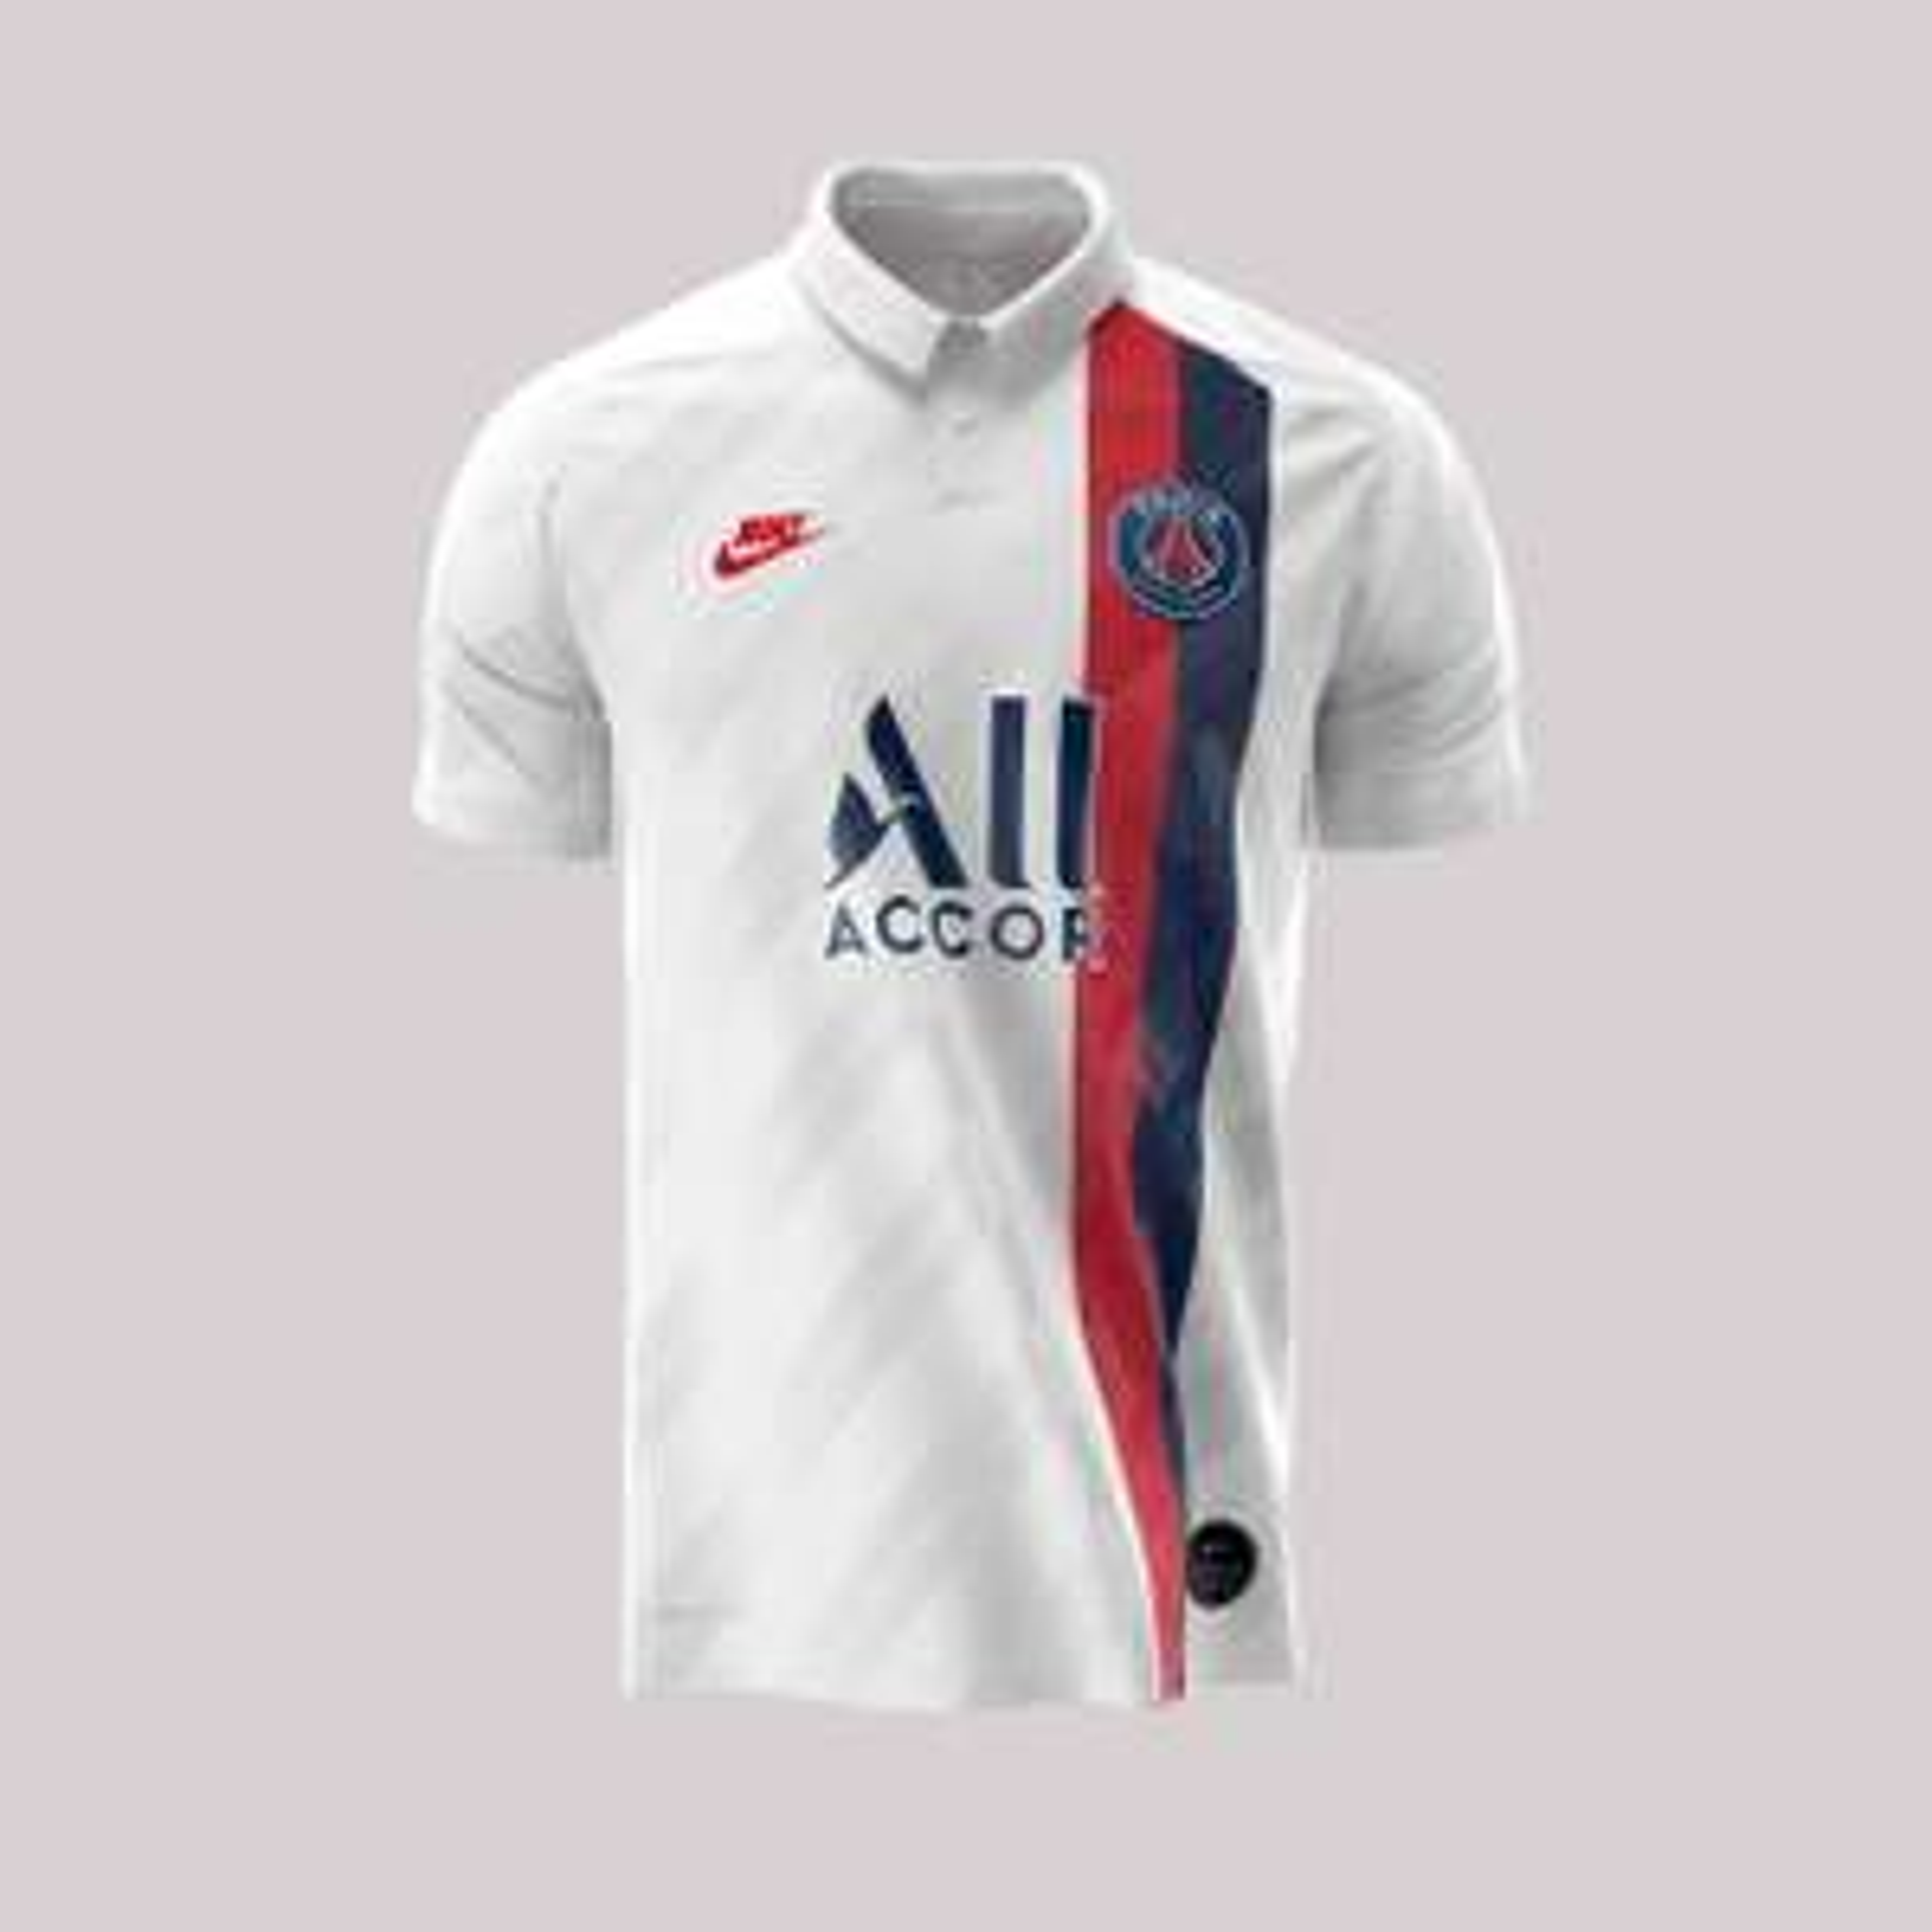 Maillot de football Nike Paris Saint-Germain - Third Stadium, Saison 19/20